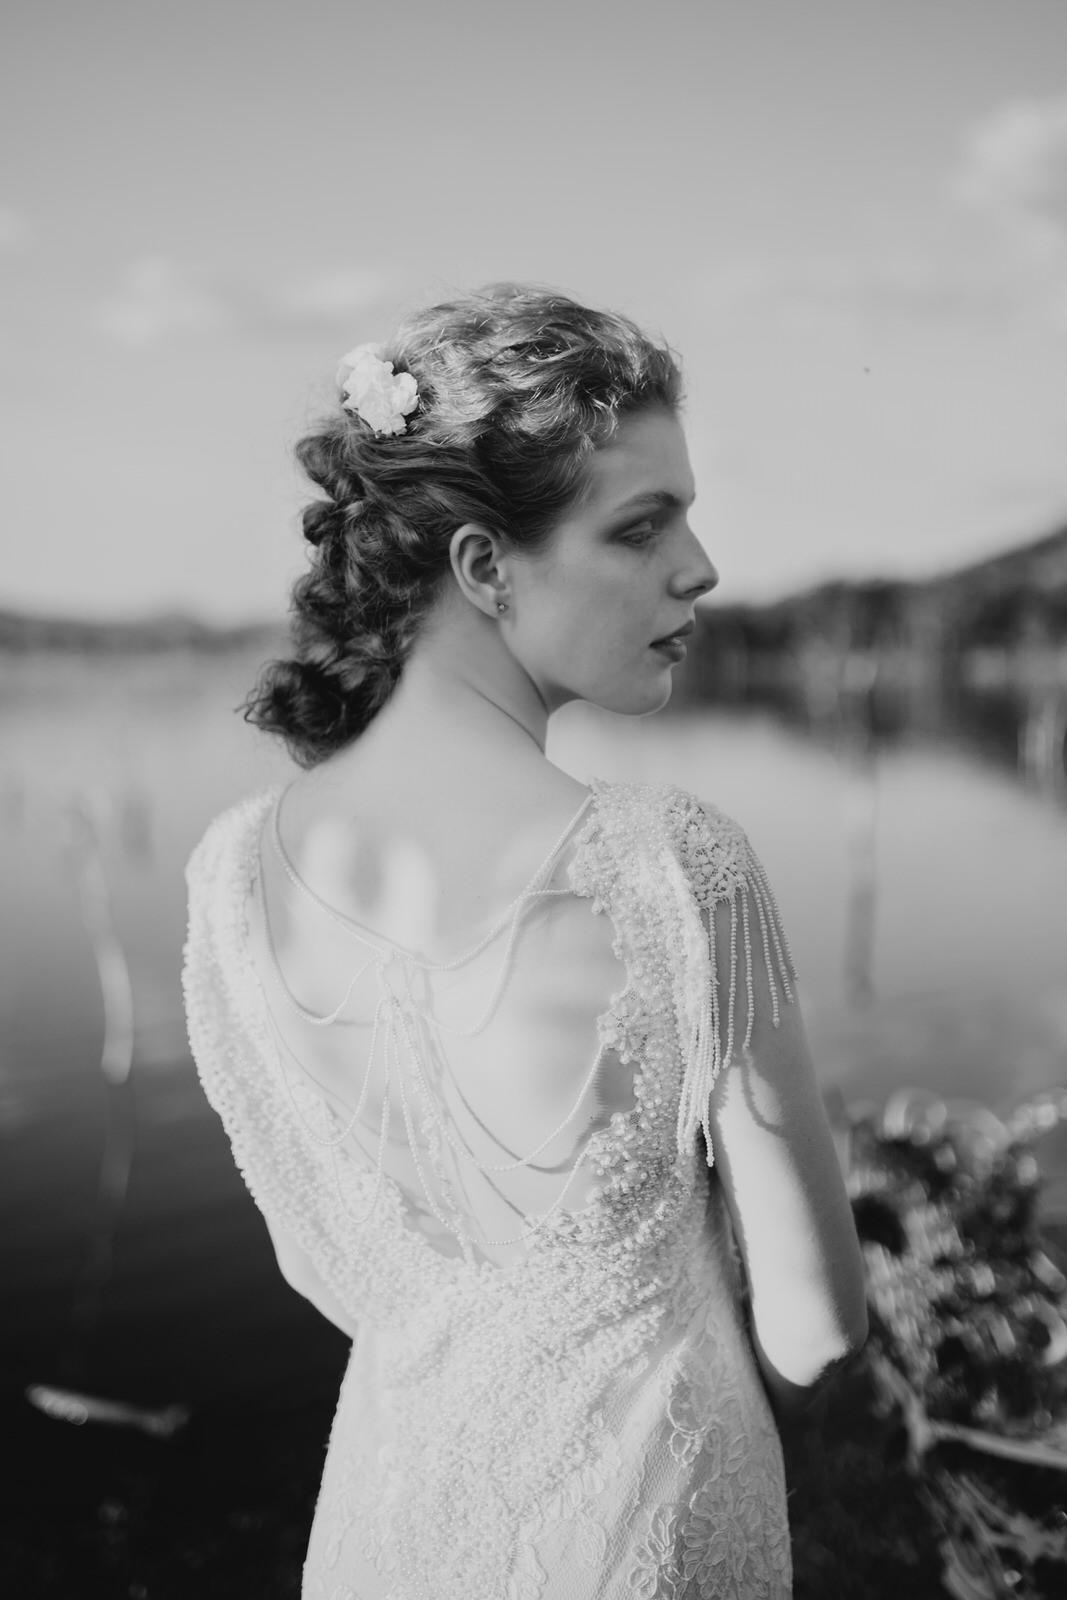 Céu_fotografia_casamentos_goiás_brasil_folk_noivas_brides_alternativo (40).jpg